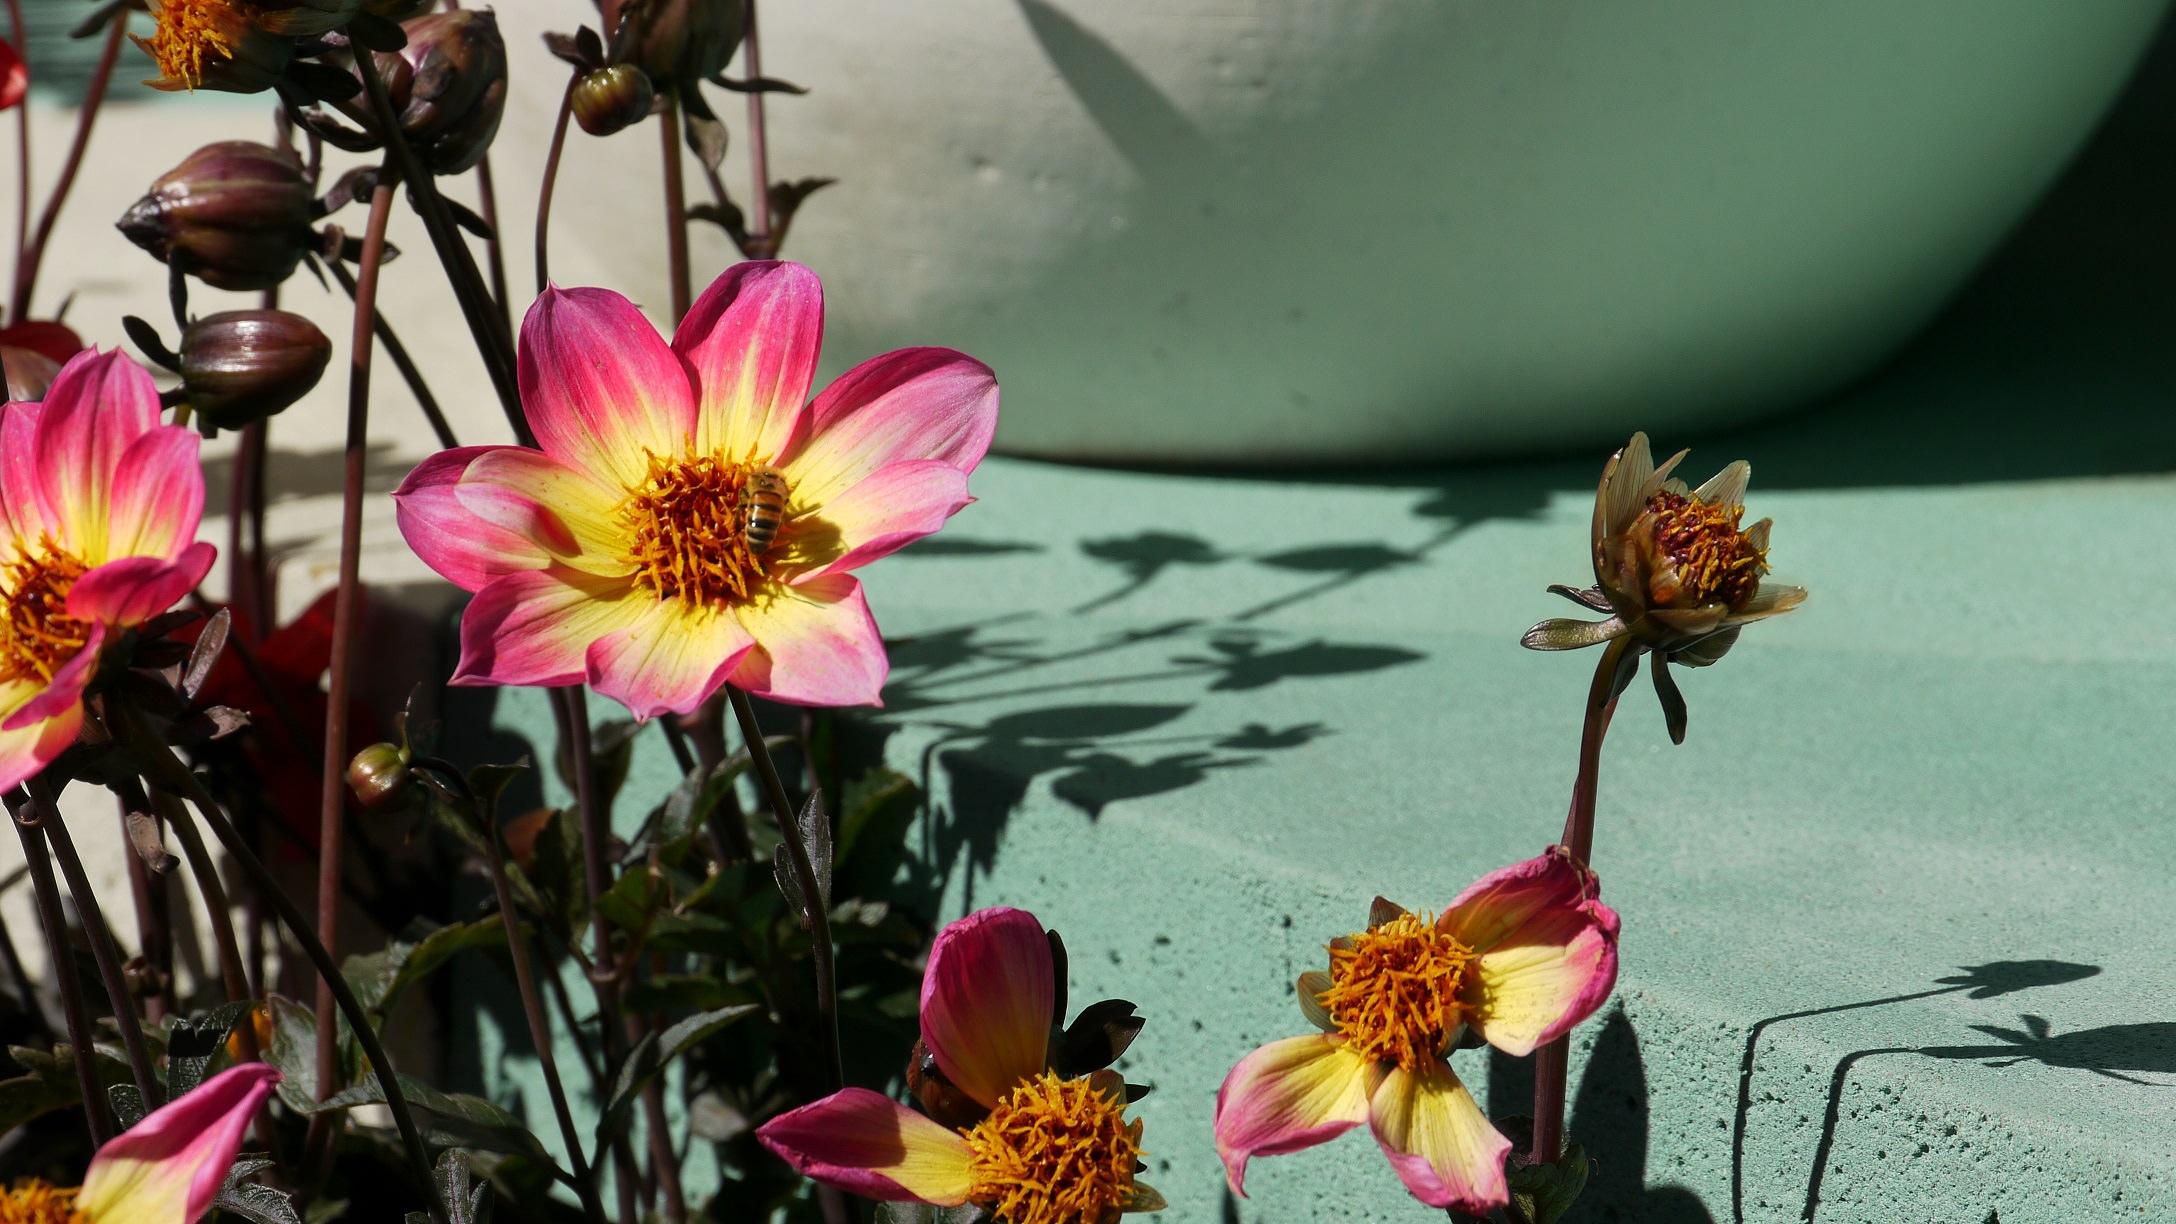 MIFGS 2014 Phillip Withers Landscape Design - Flowers